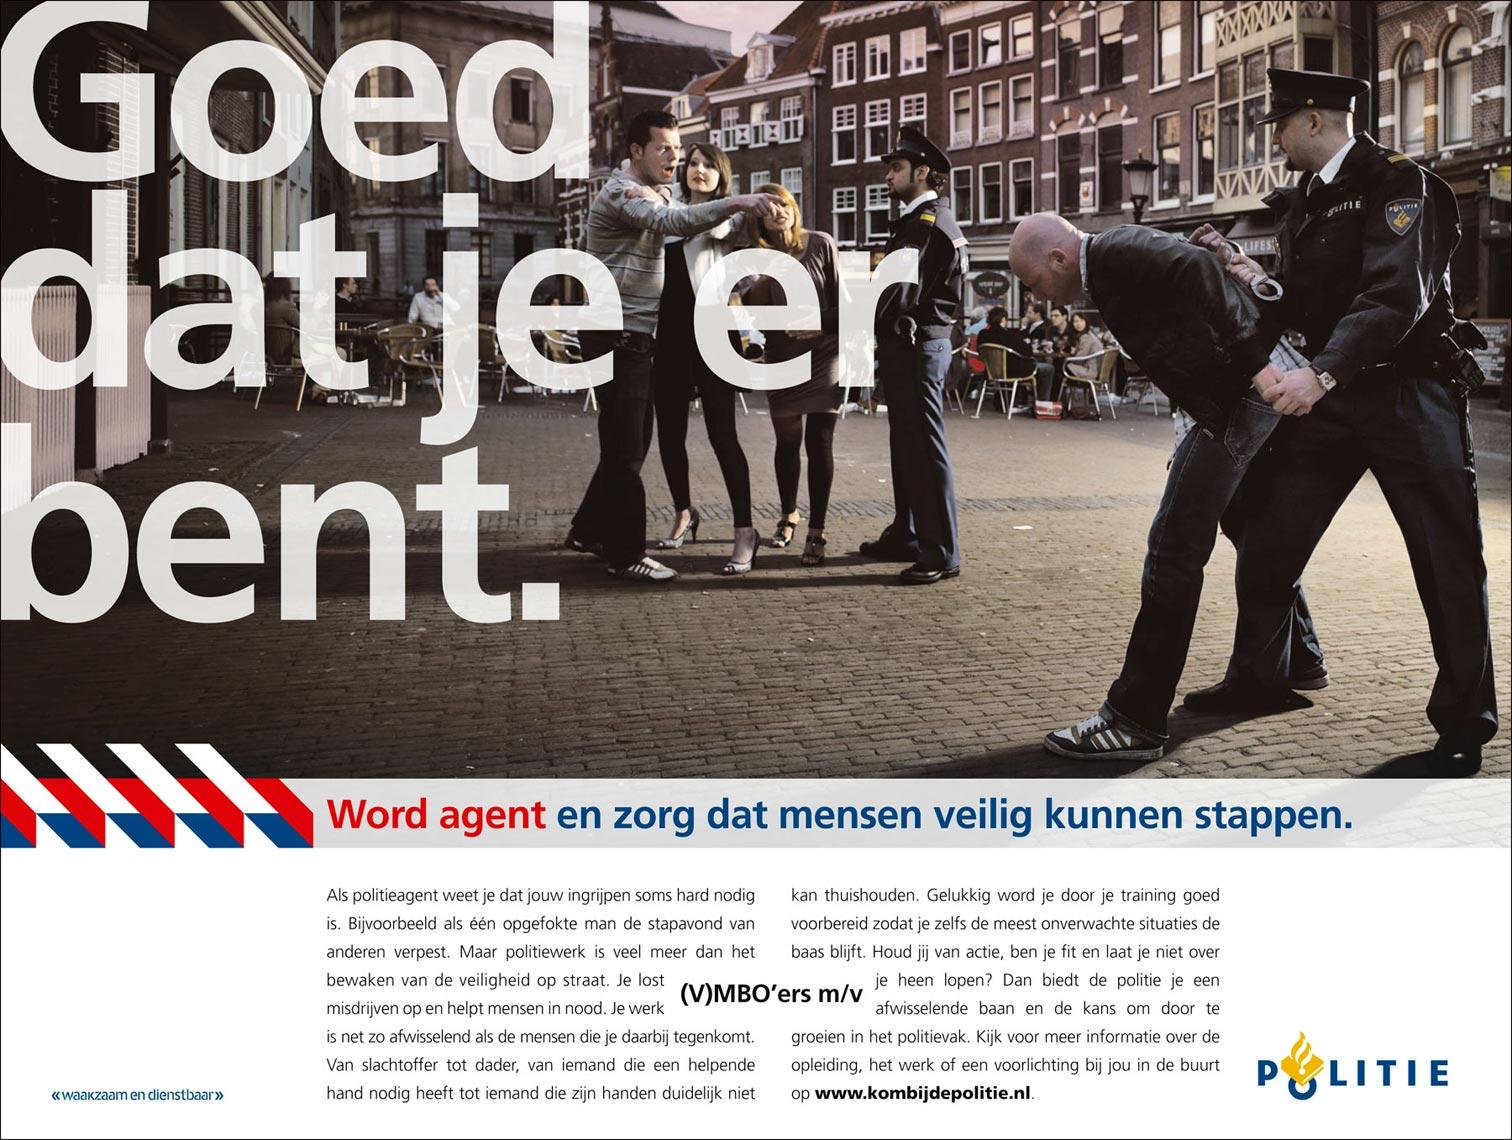 maximum-politie-reclamefotografie-pim-vuik-fotografie-rotterdam-02.jpg